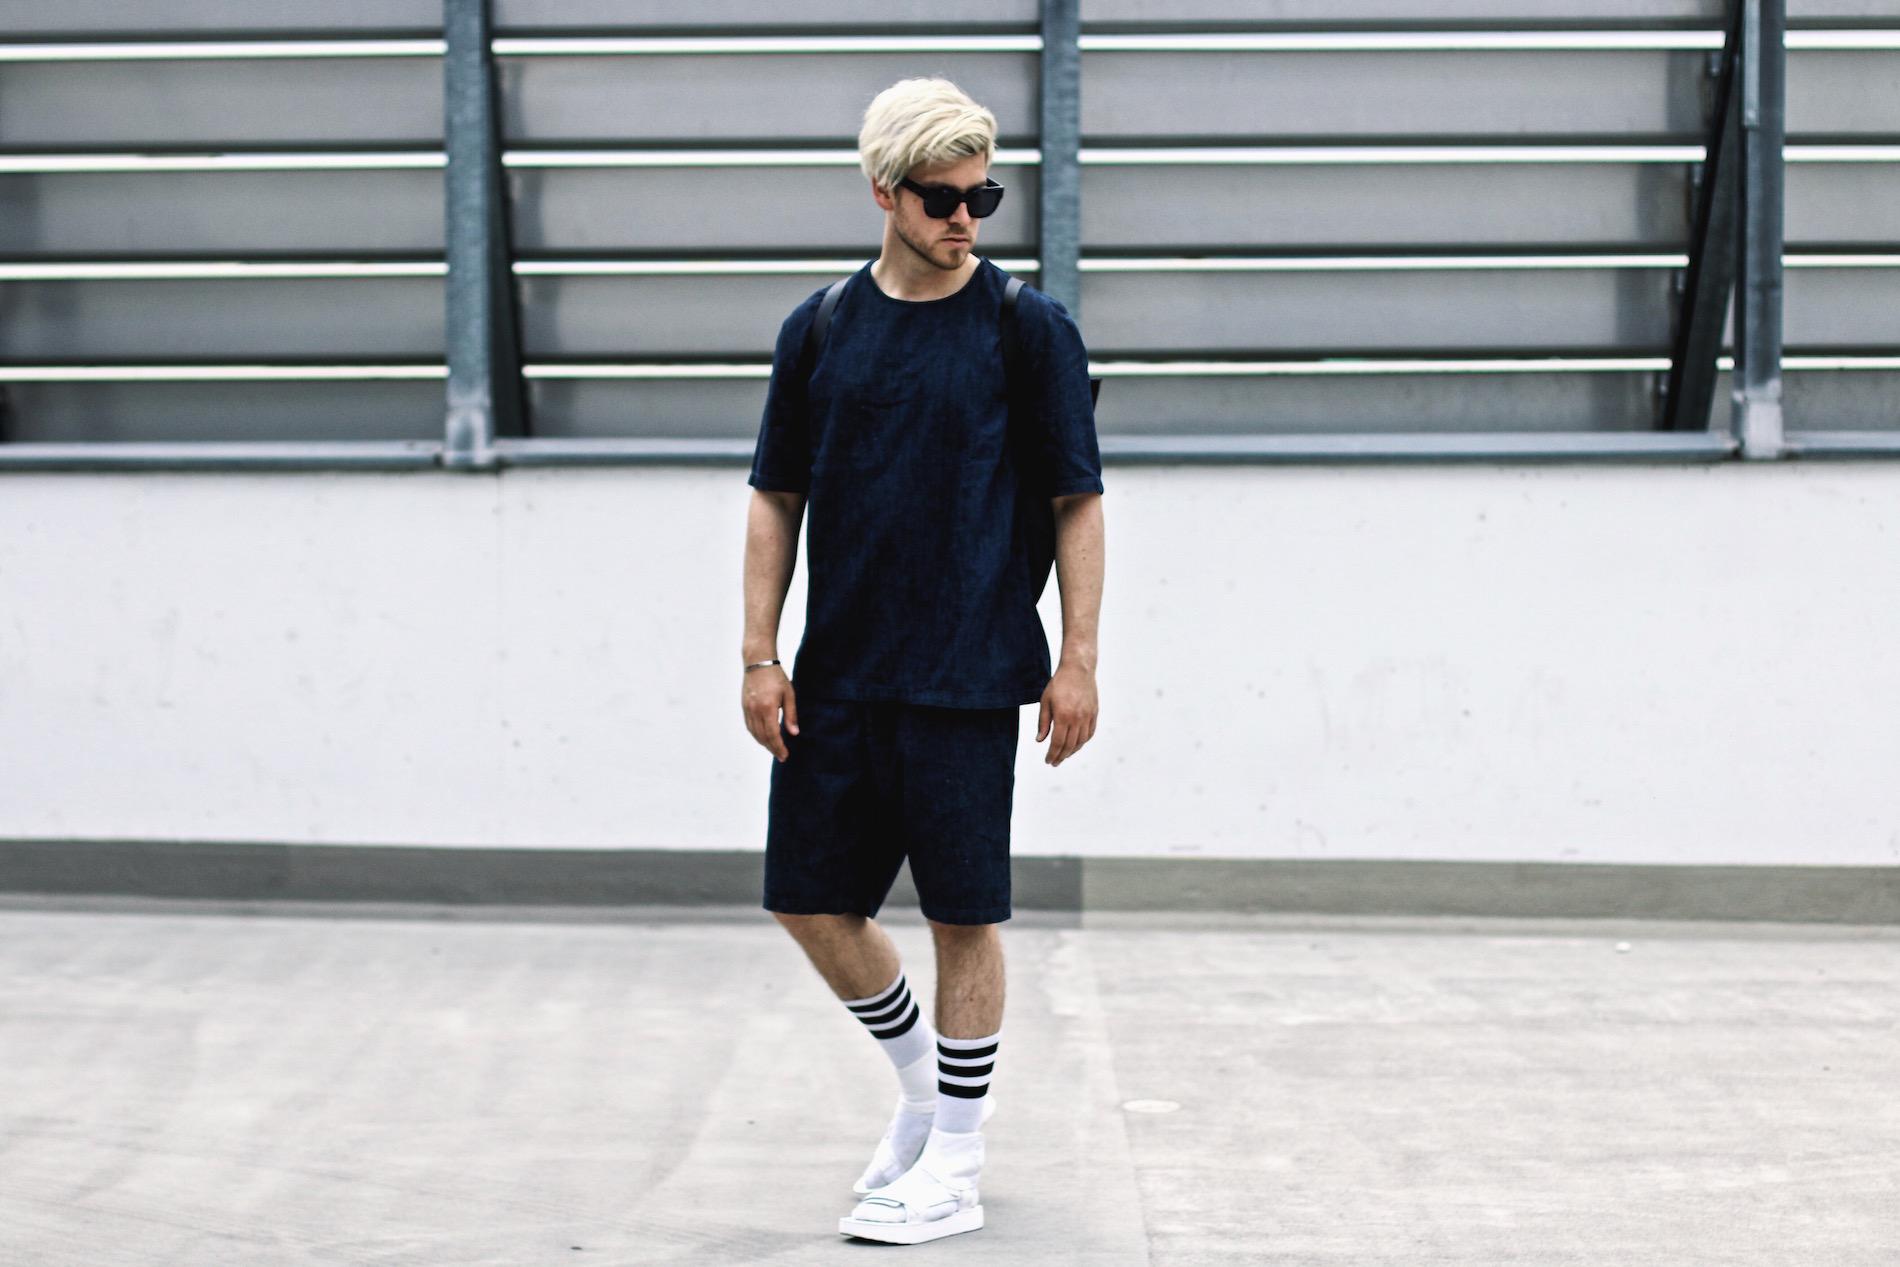 Han And X Denim Kjobenhavn Twinsy Teva Sandals H amp;m E29IeHWDY